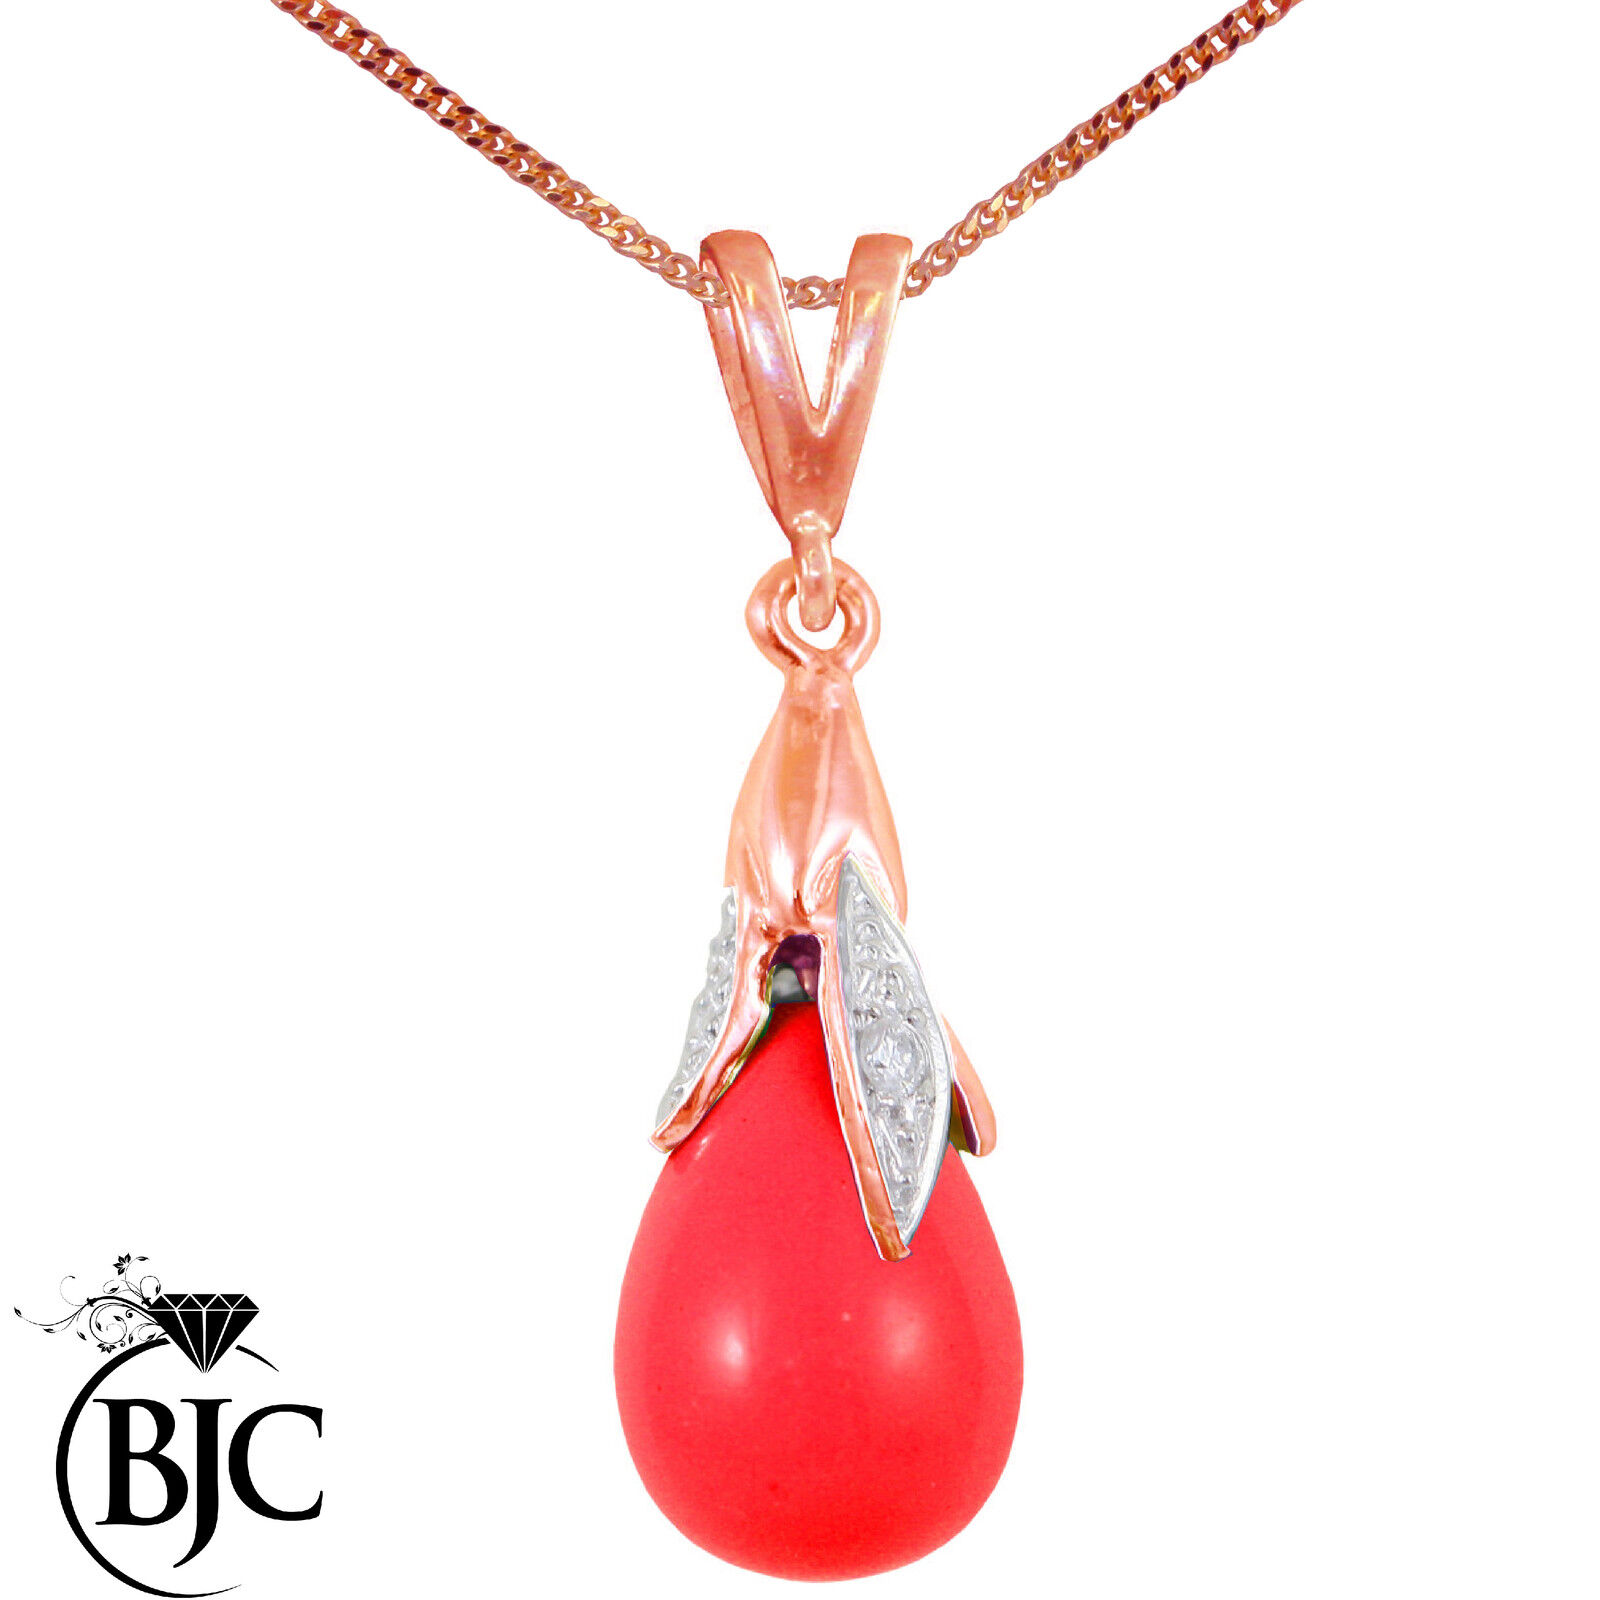 BJC 9kt gold pink red Sangue Corallo & Diamante Taglio Briolette